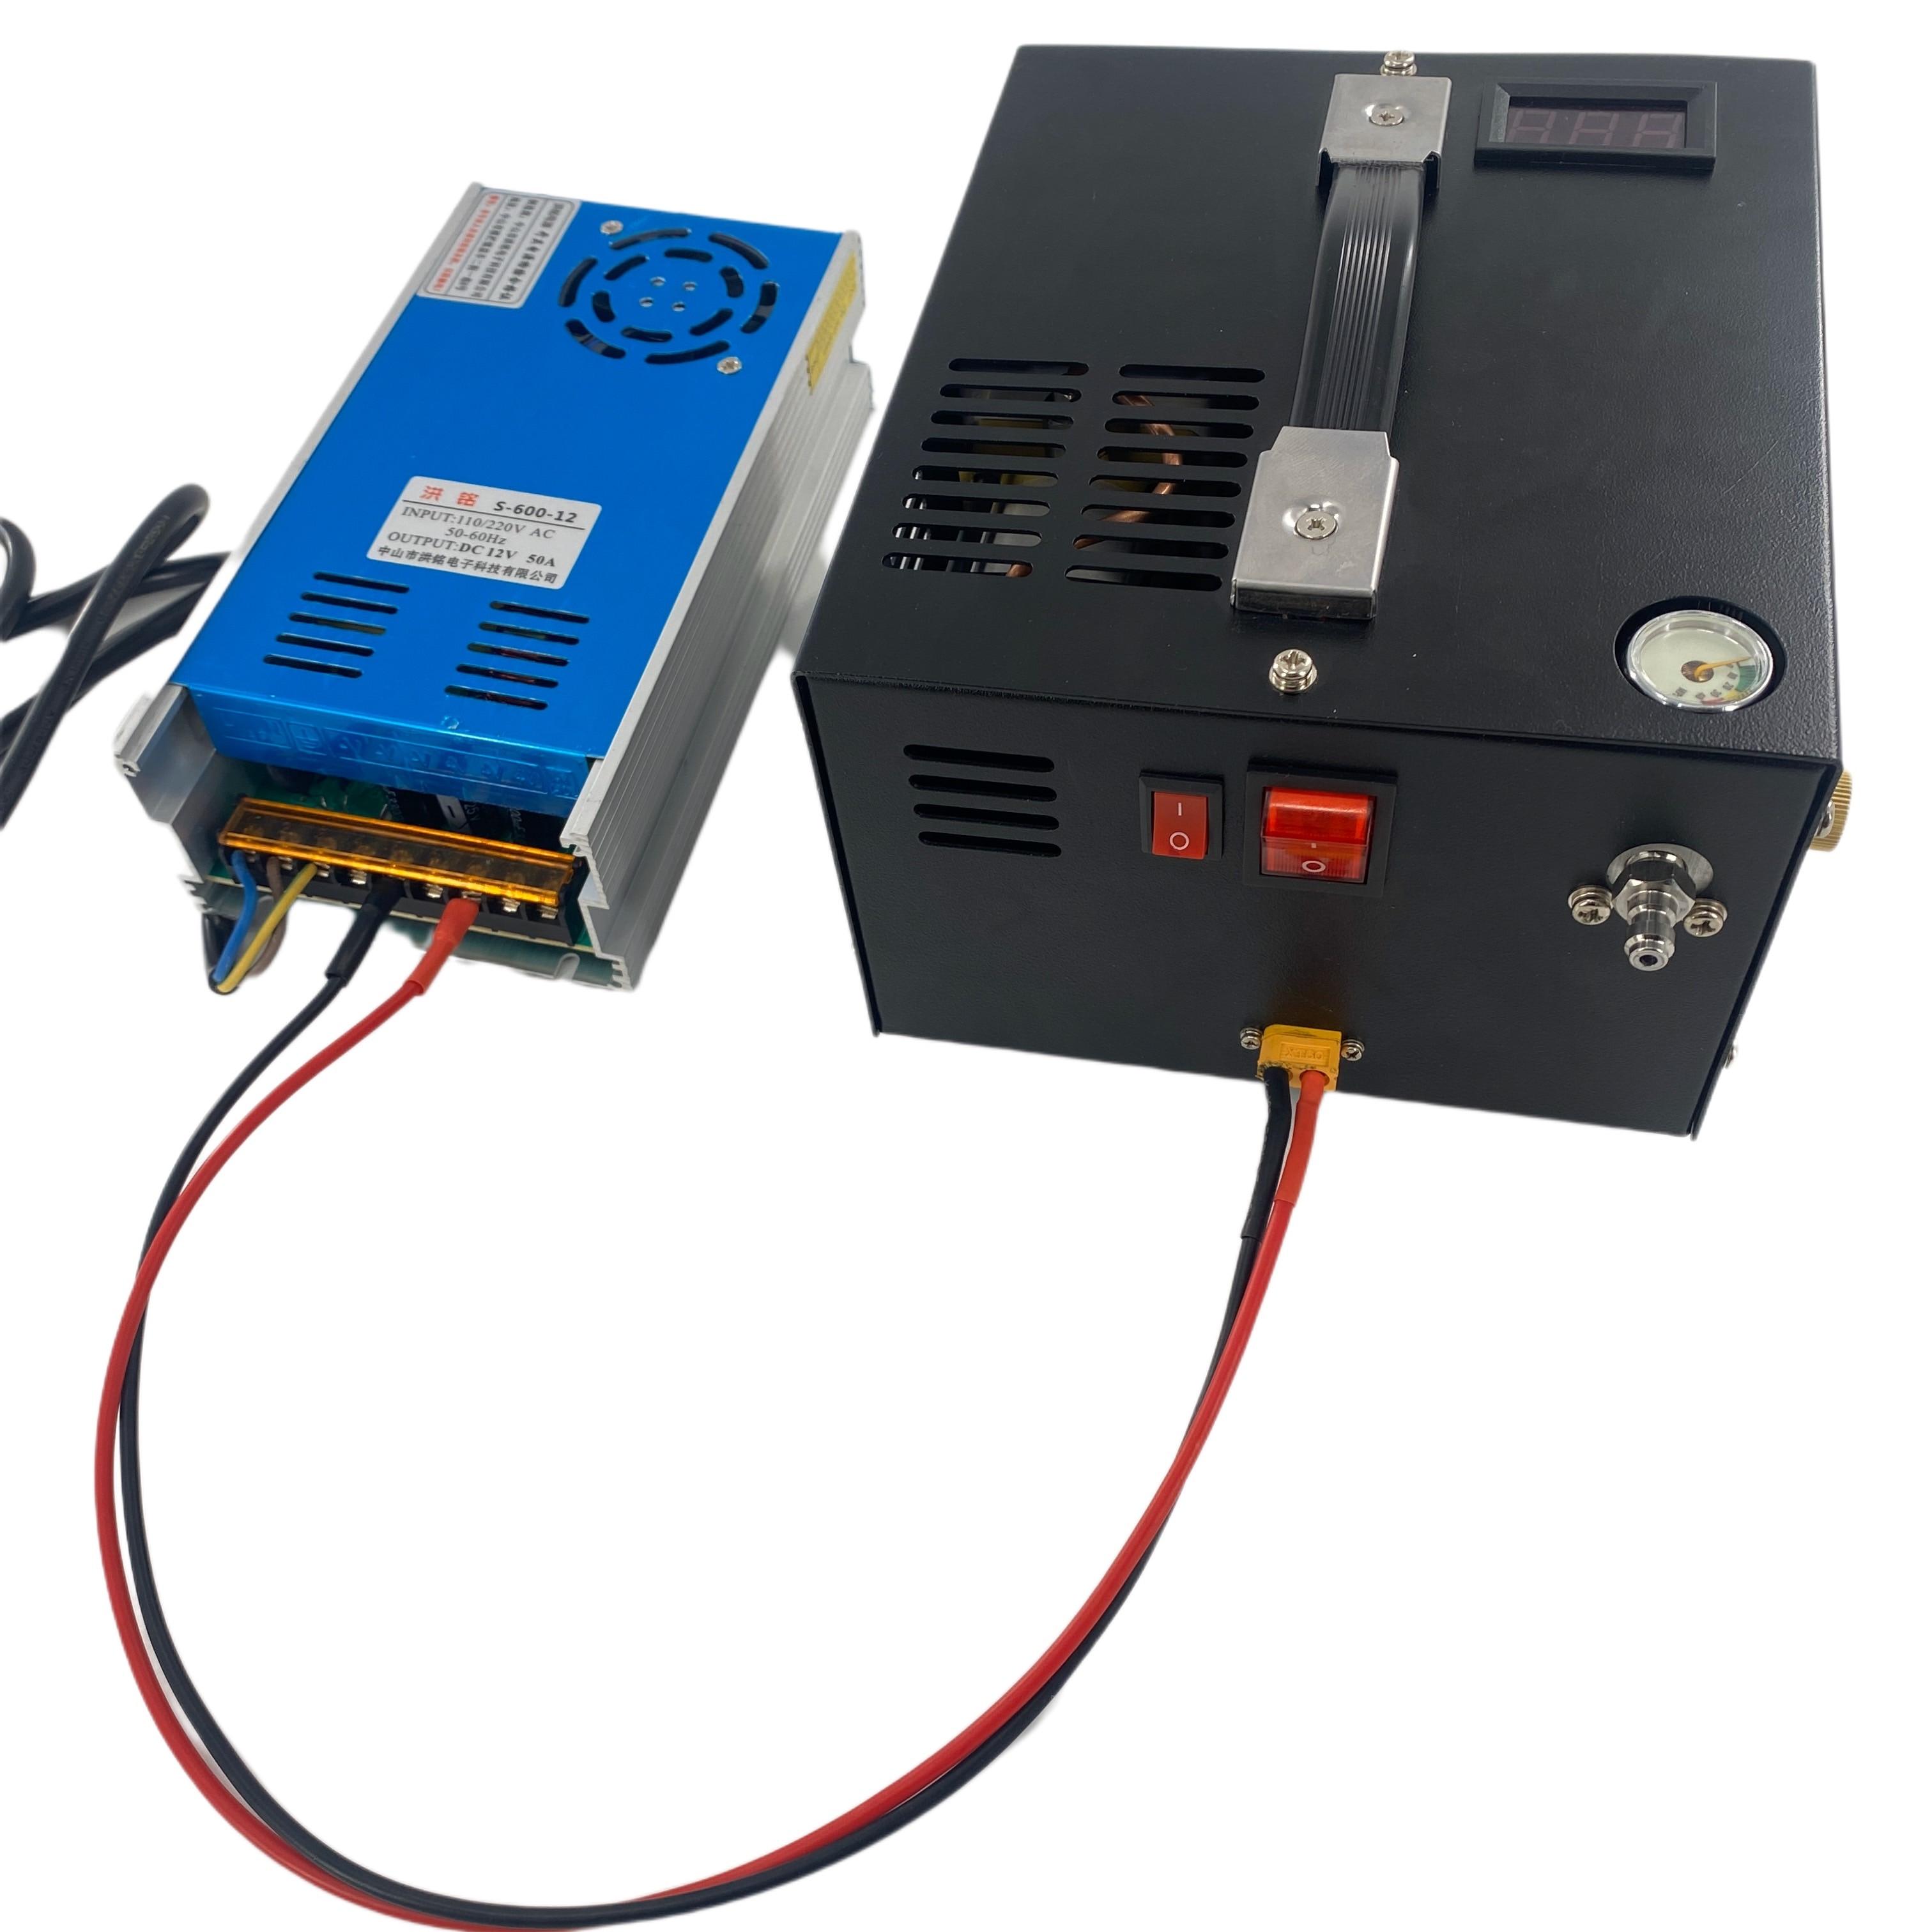 ضاغط بضغط 300 بار 30mpa 12 فولت pcp مع محول 110/220 فولت ضاغط بضغط 12 فولت pcp ضاغط 4500psi